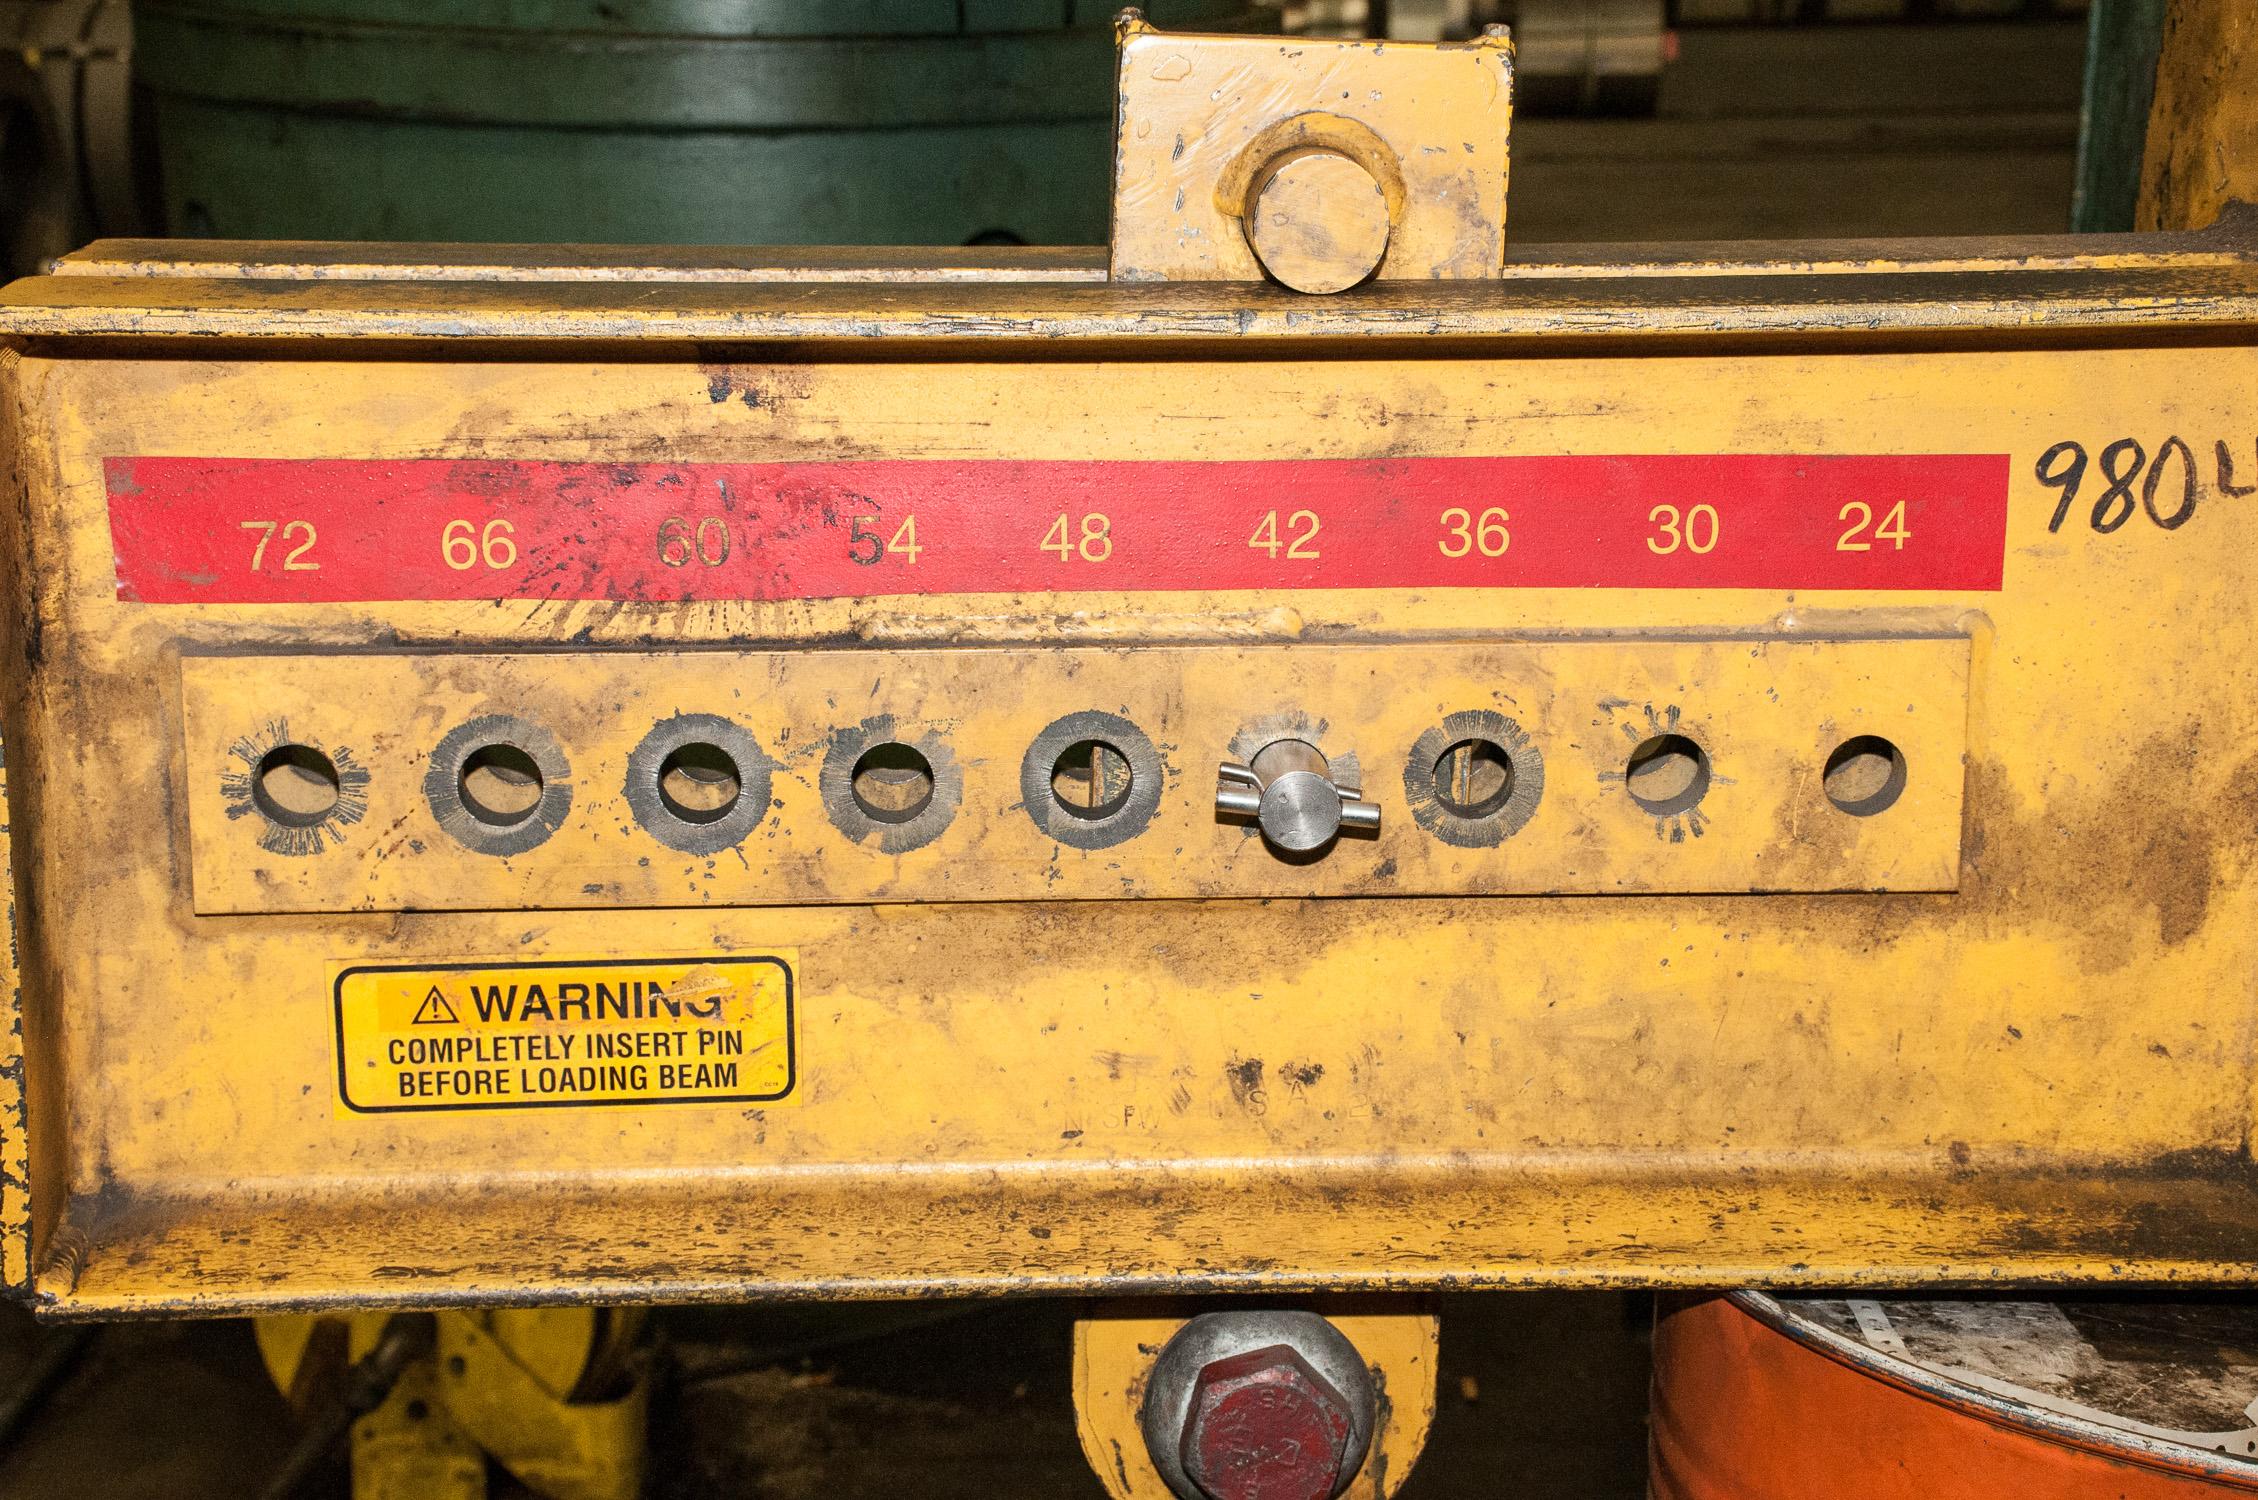 "Caldwell Co 30 Ton Spreader Bar adjustable 24""-72"" For Crane - Image 2 of 4"